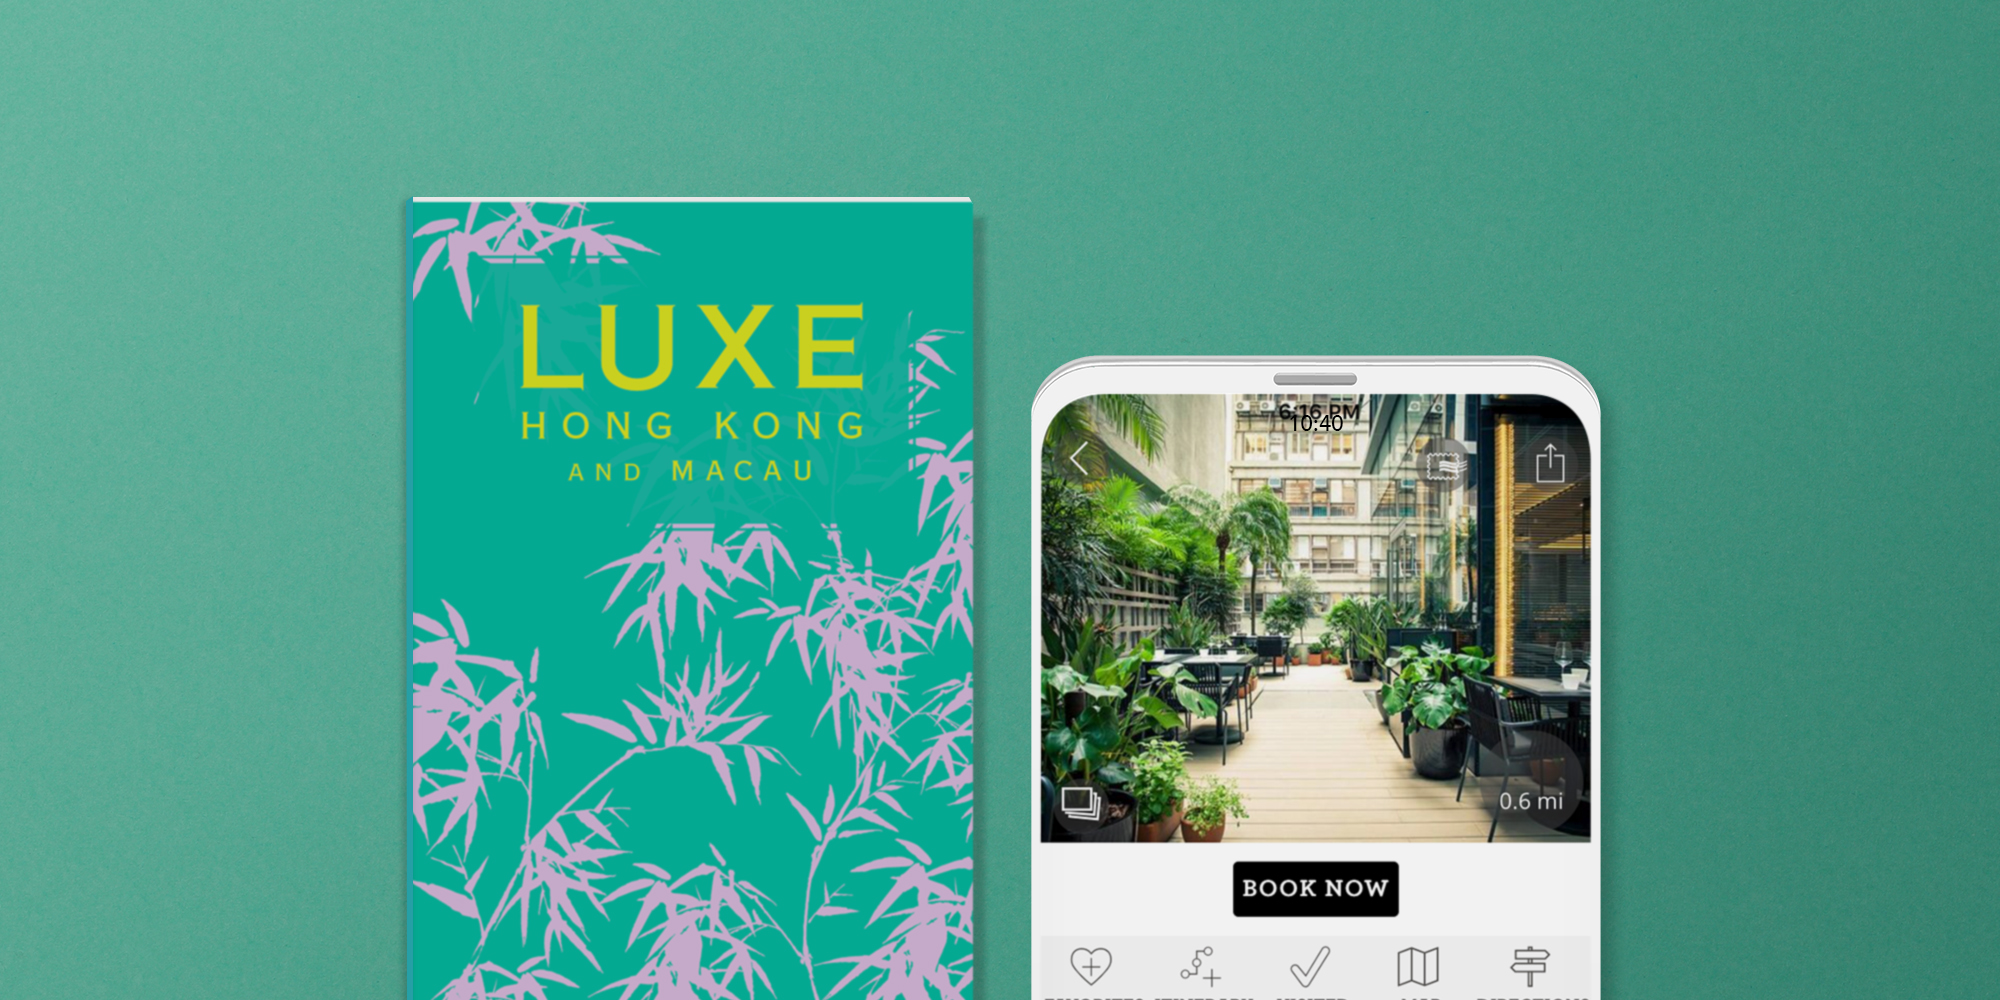 Hong Kong print guide and digital guide